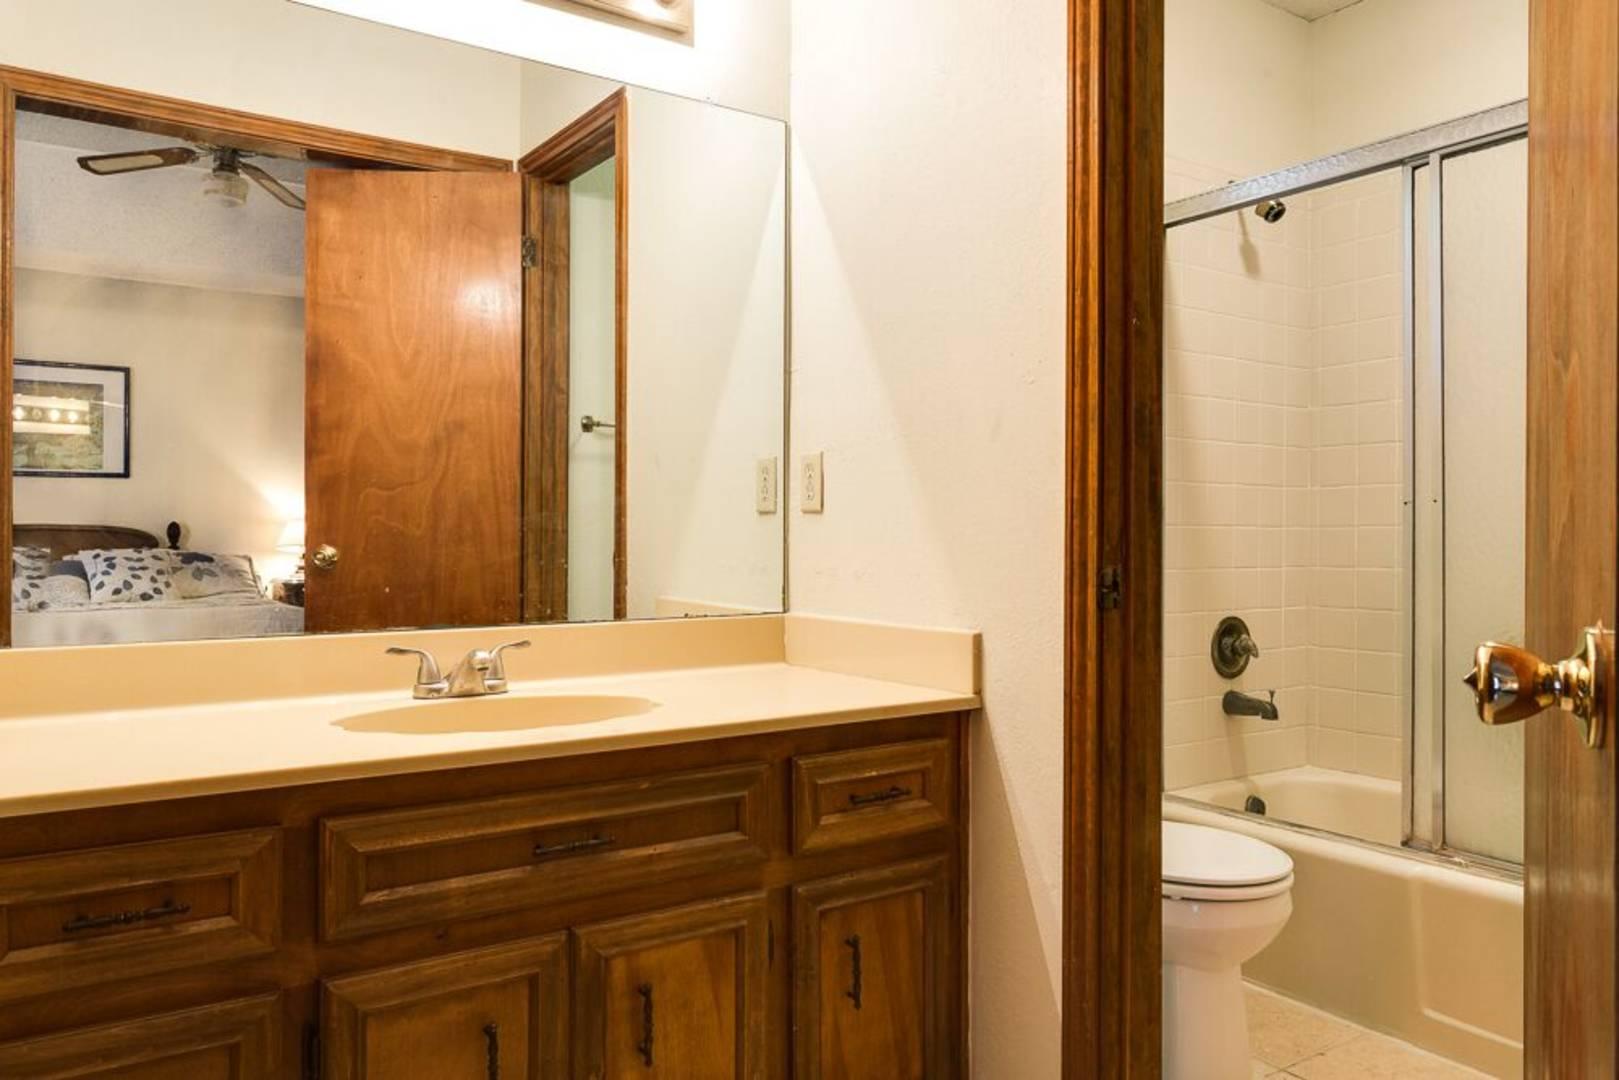 Cabinets Mcallen Tx Brivity 121 E Fern Ave Mcallen Tx 78501 Virtual Tour